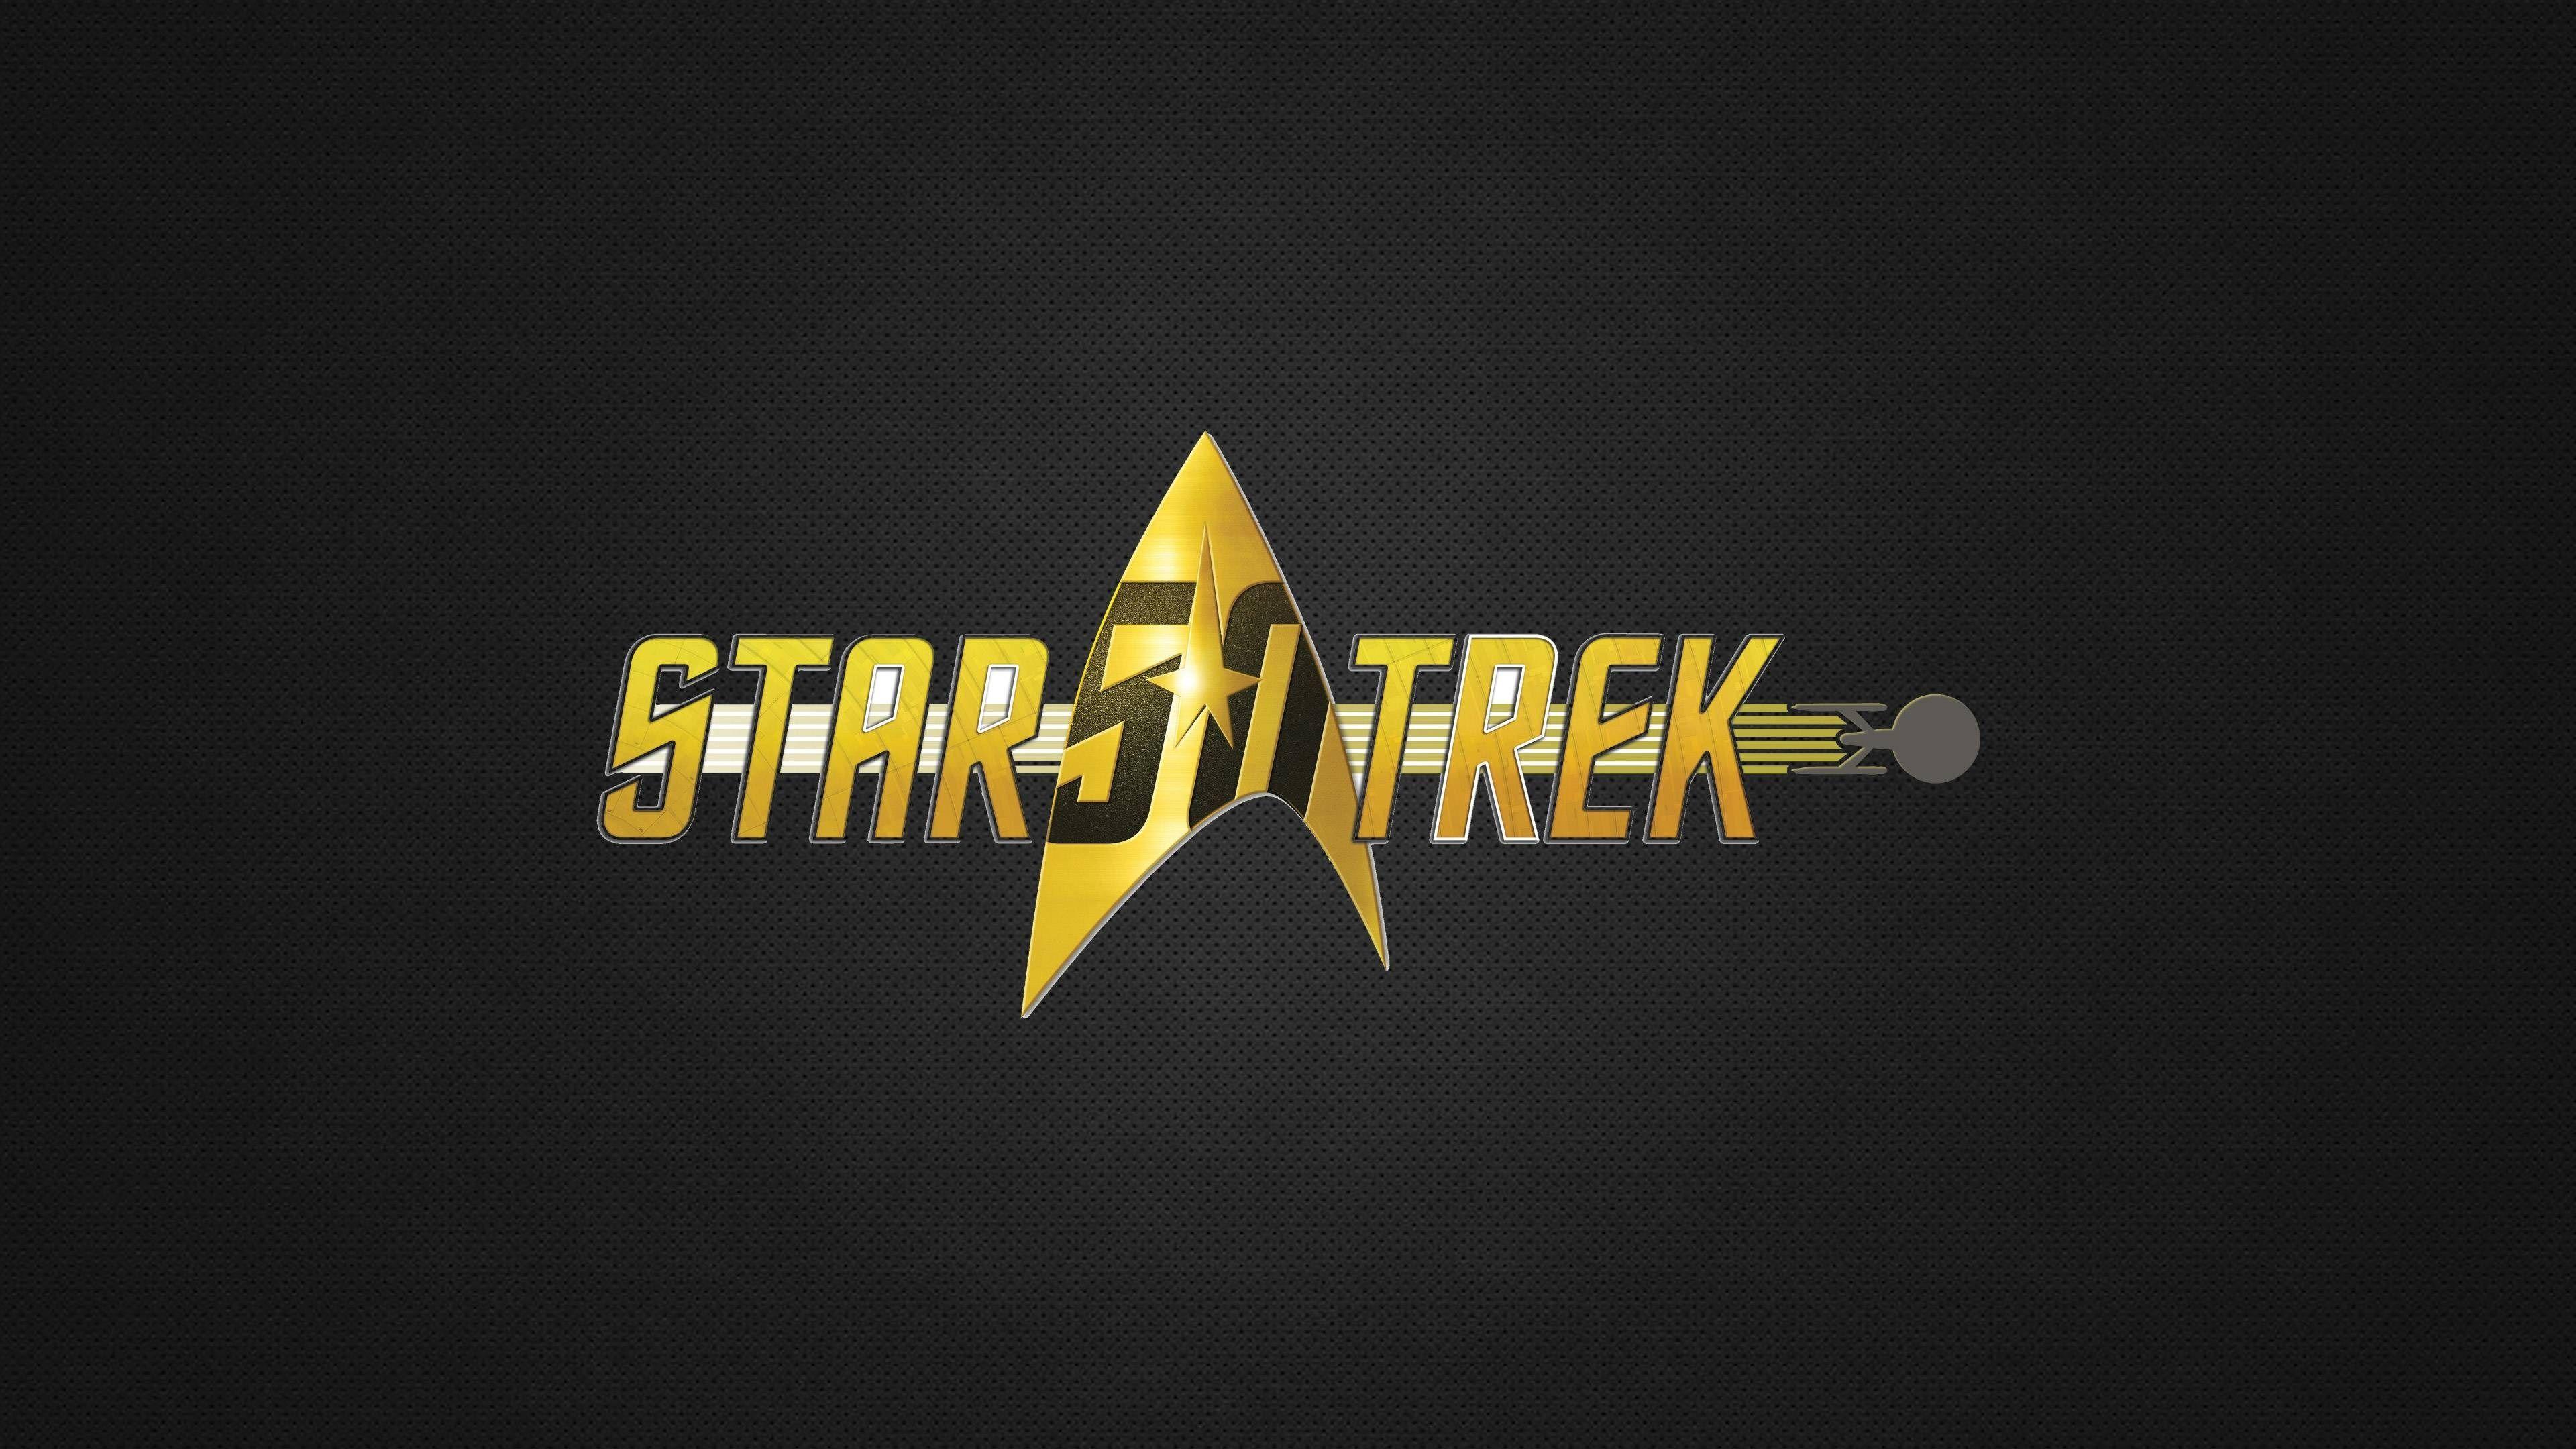 3840x2160 Star Trek Beyond 4k Best Wallpaper Hd Star Trek 50th Anniversary Star Trek Star Trek Wallpaper